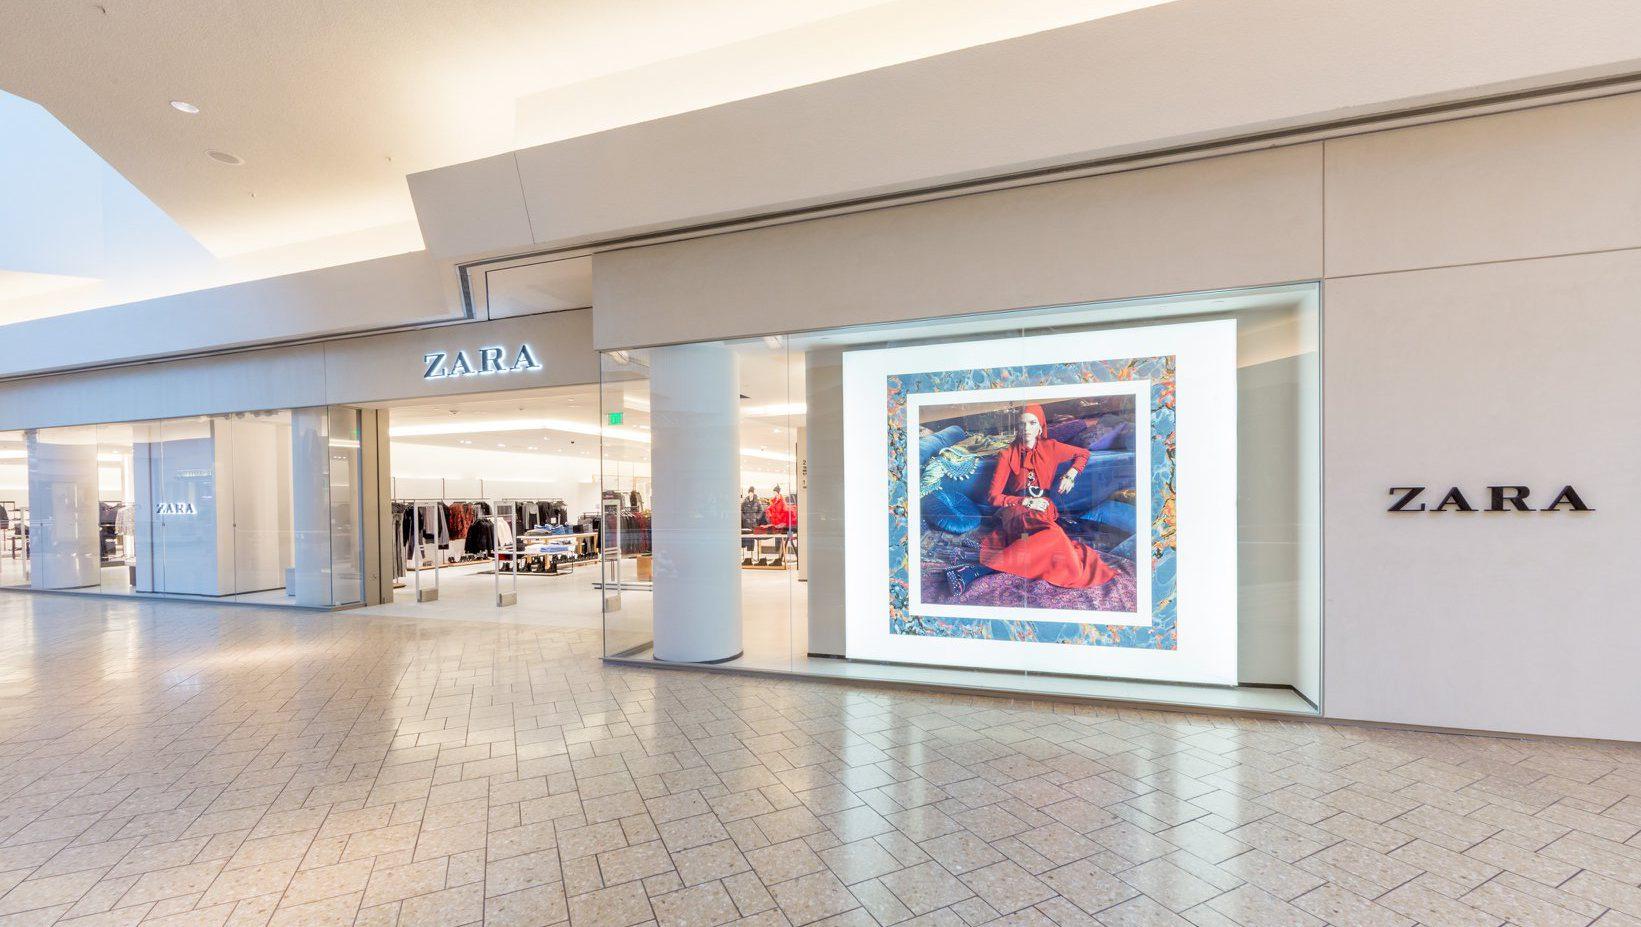 Zara store in Colorado